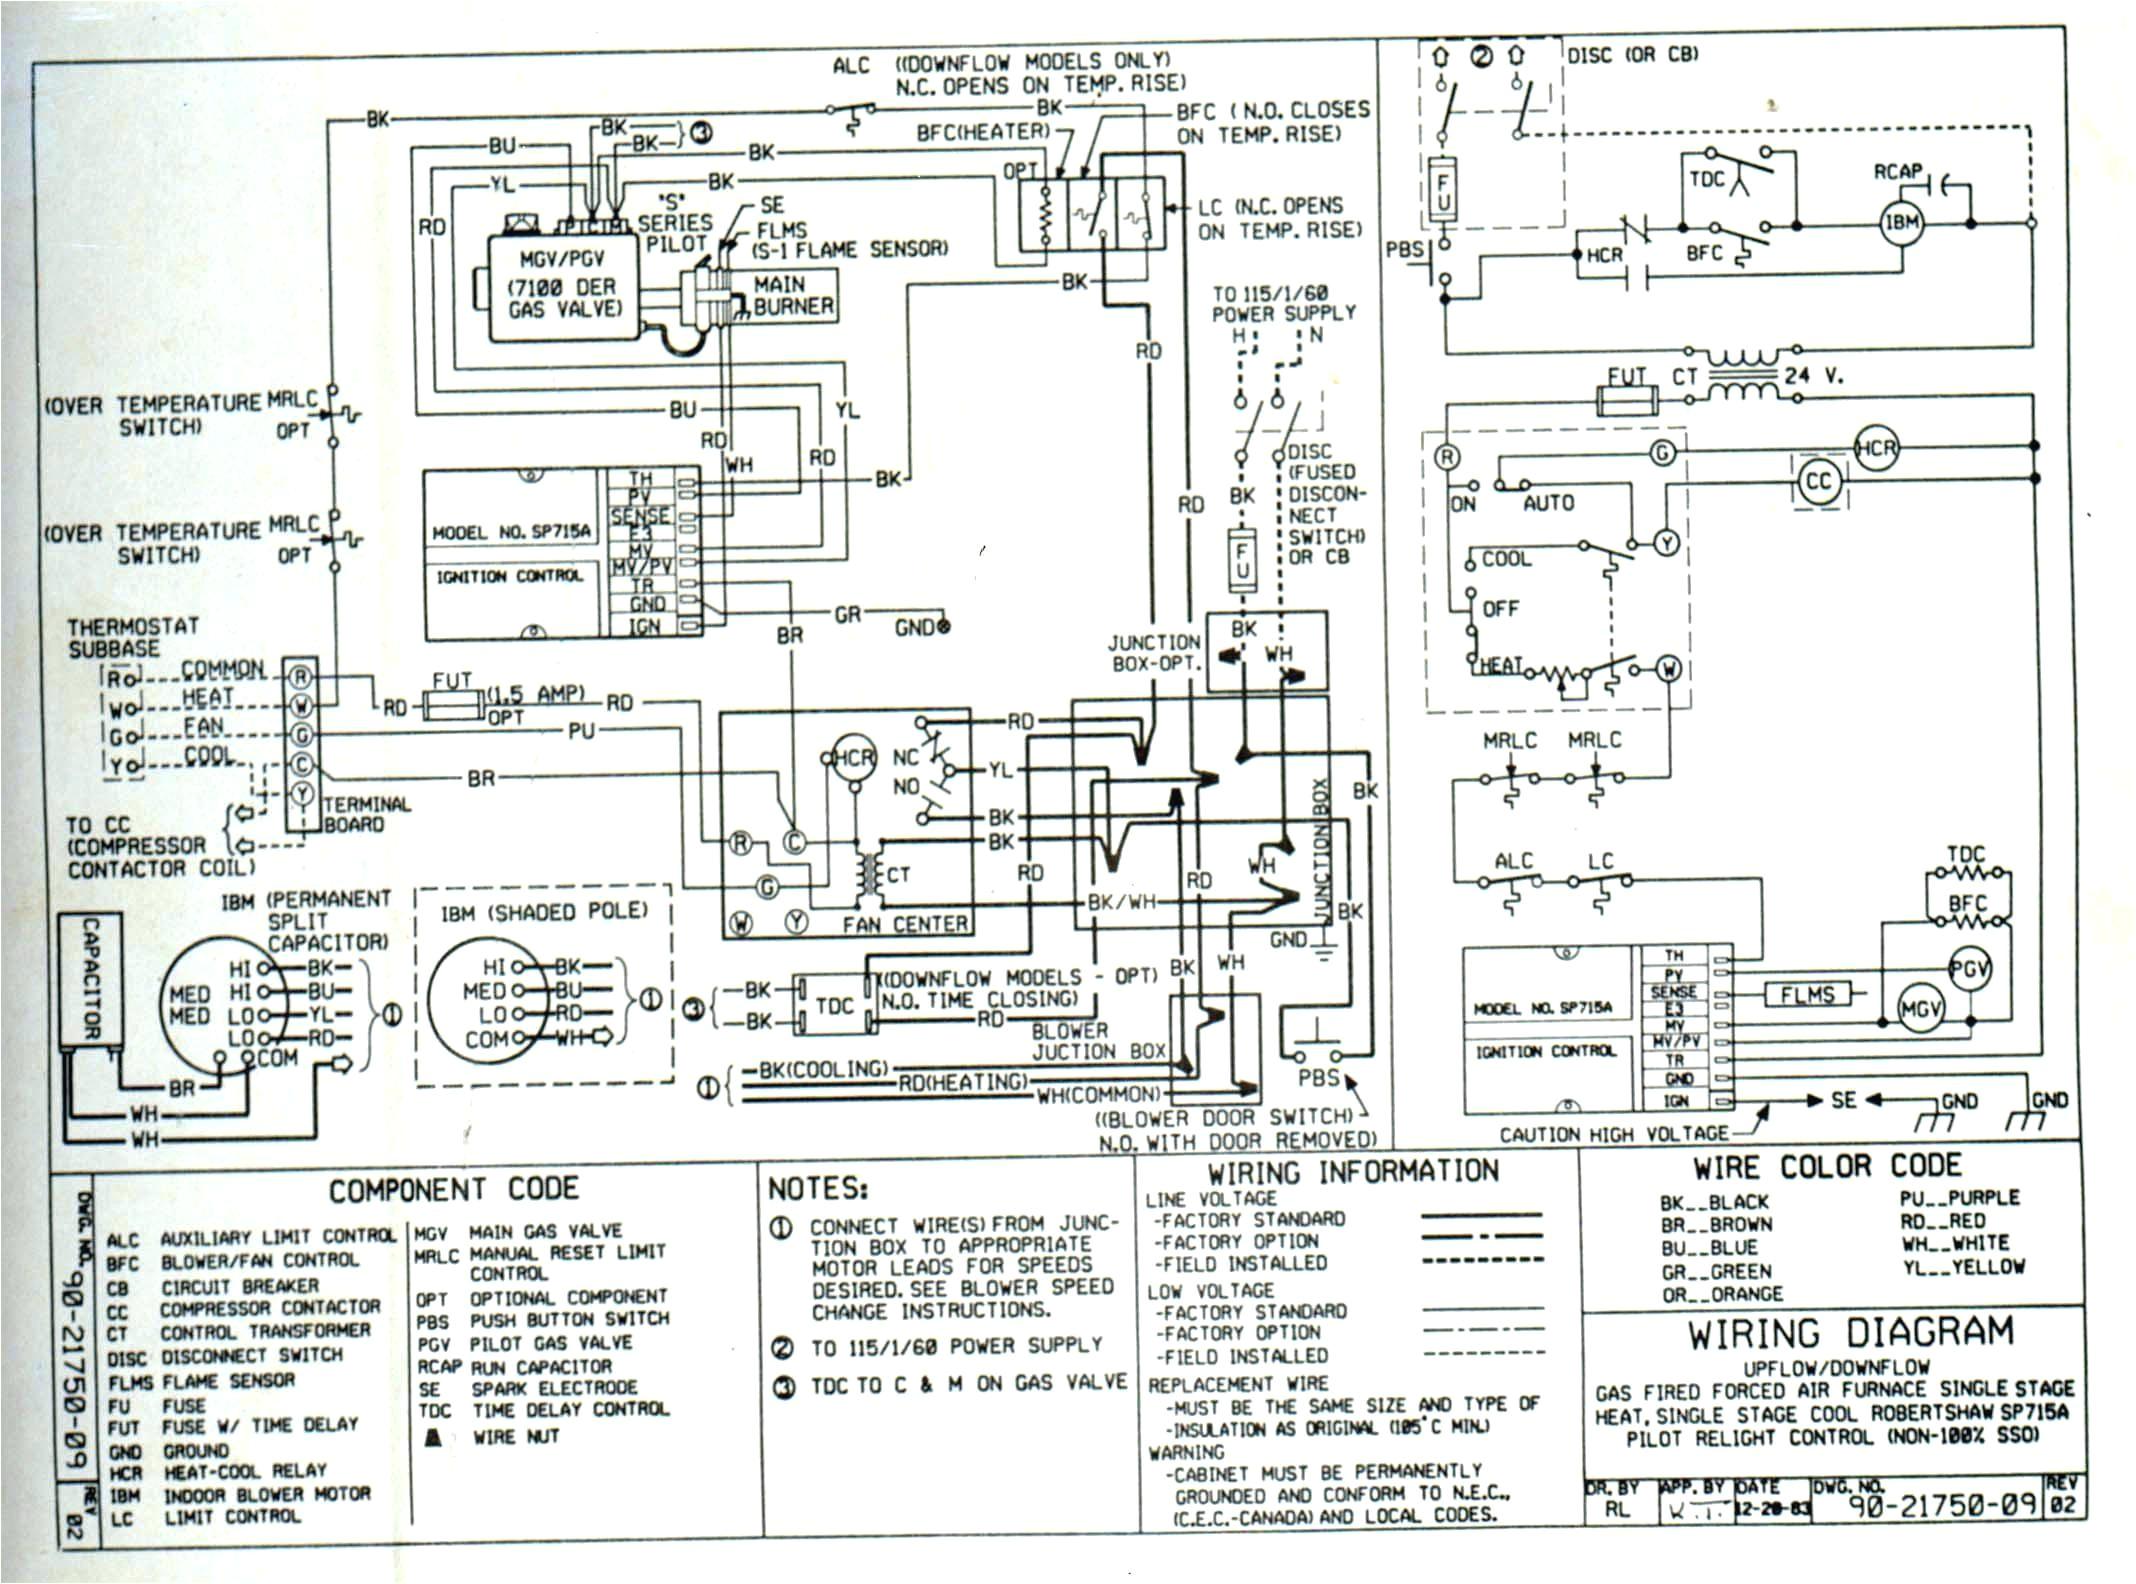 trane furnace wiring diagram model numtuh1b wiring diagram completed trane wiring schematics trane wiring schematics